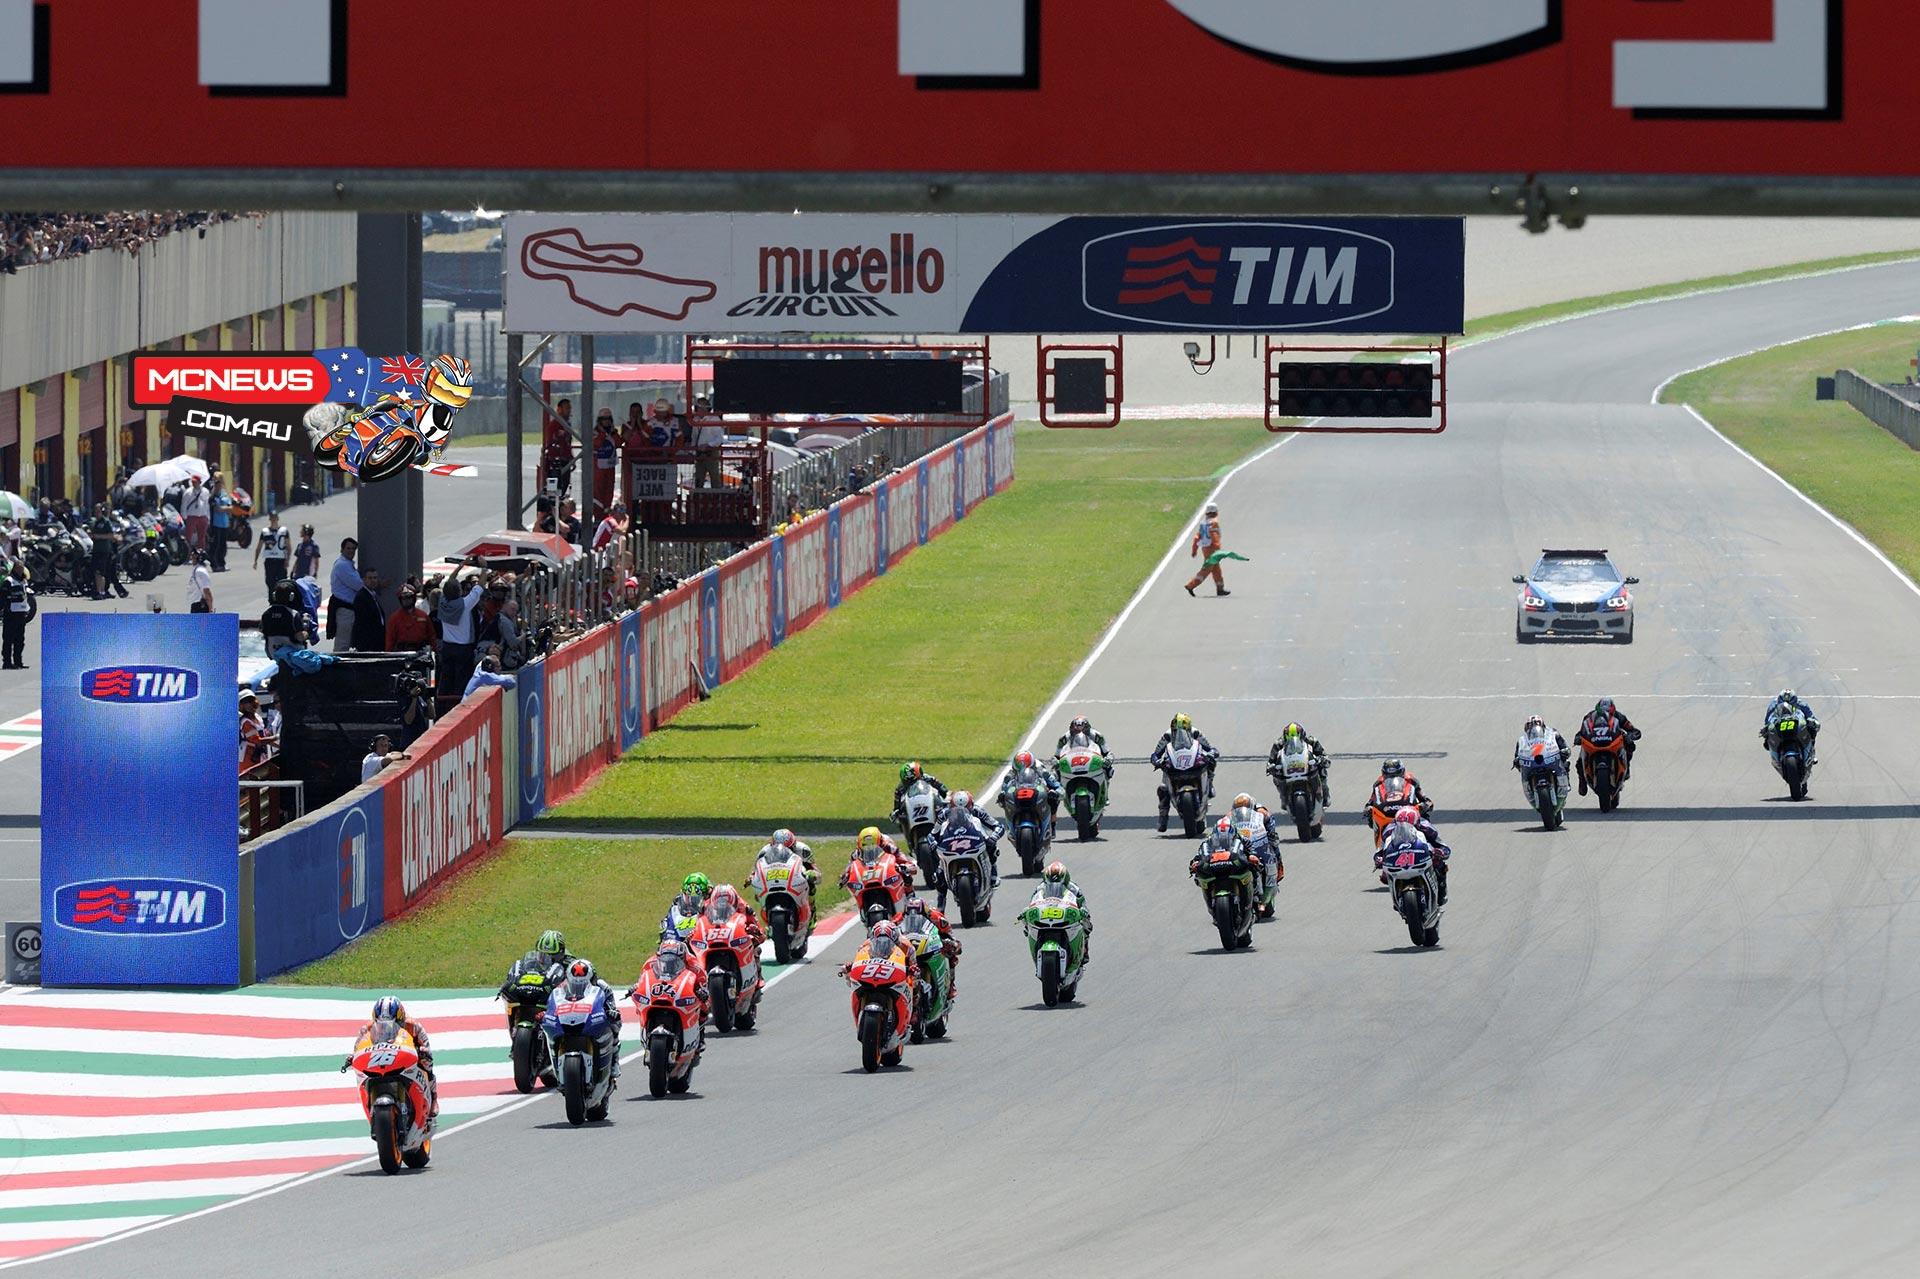 Start of the 2013 Italian Grand Prix at Mugello